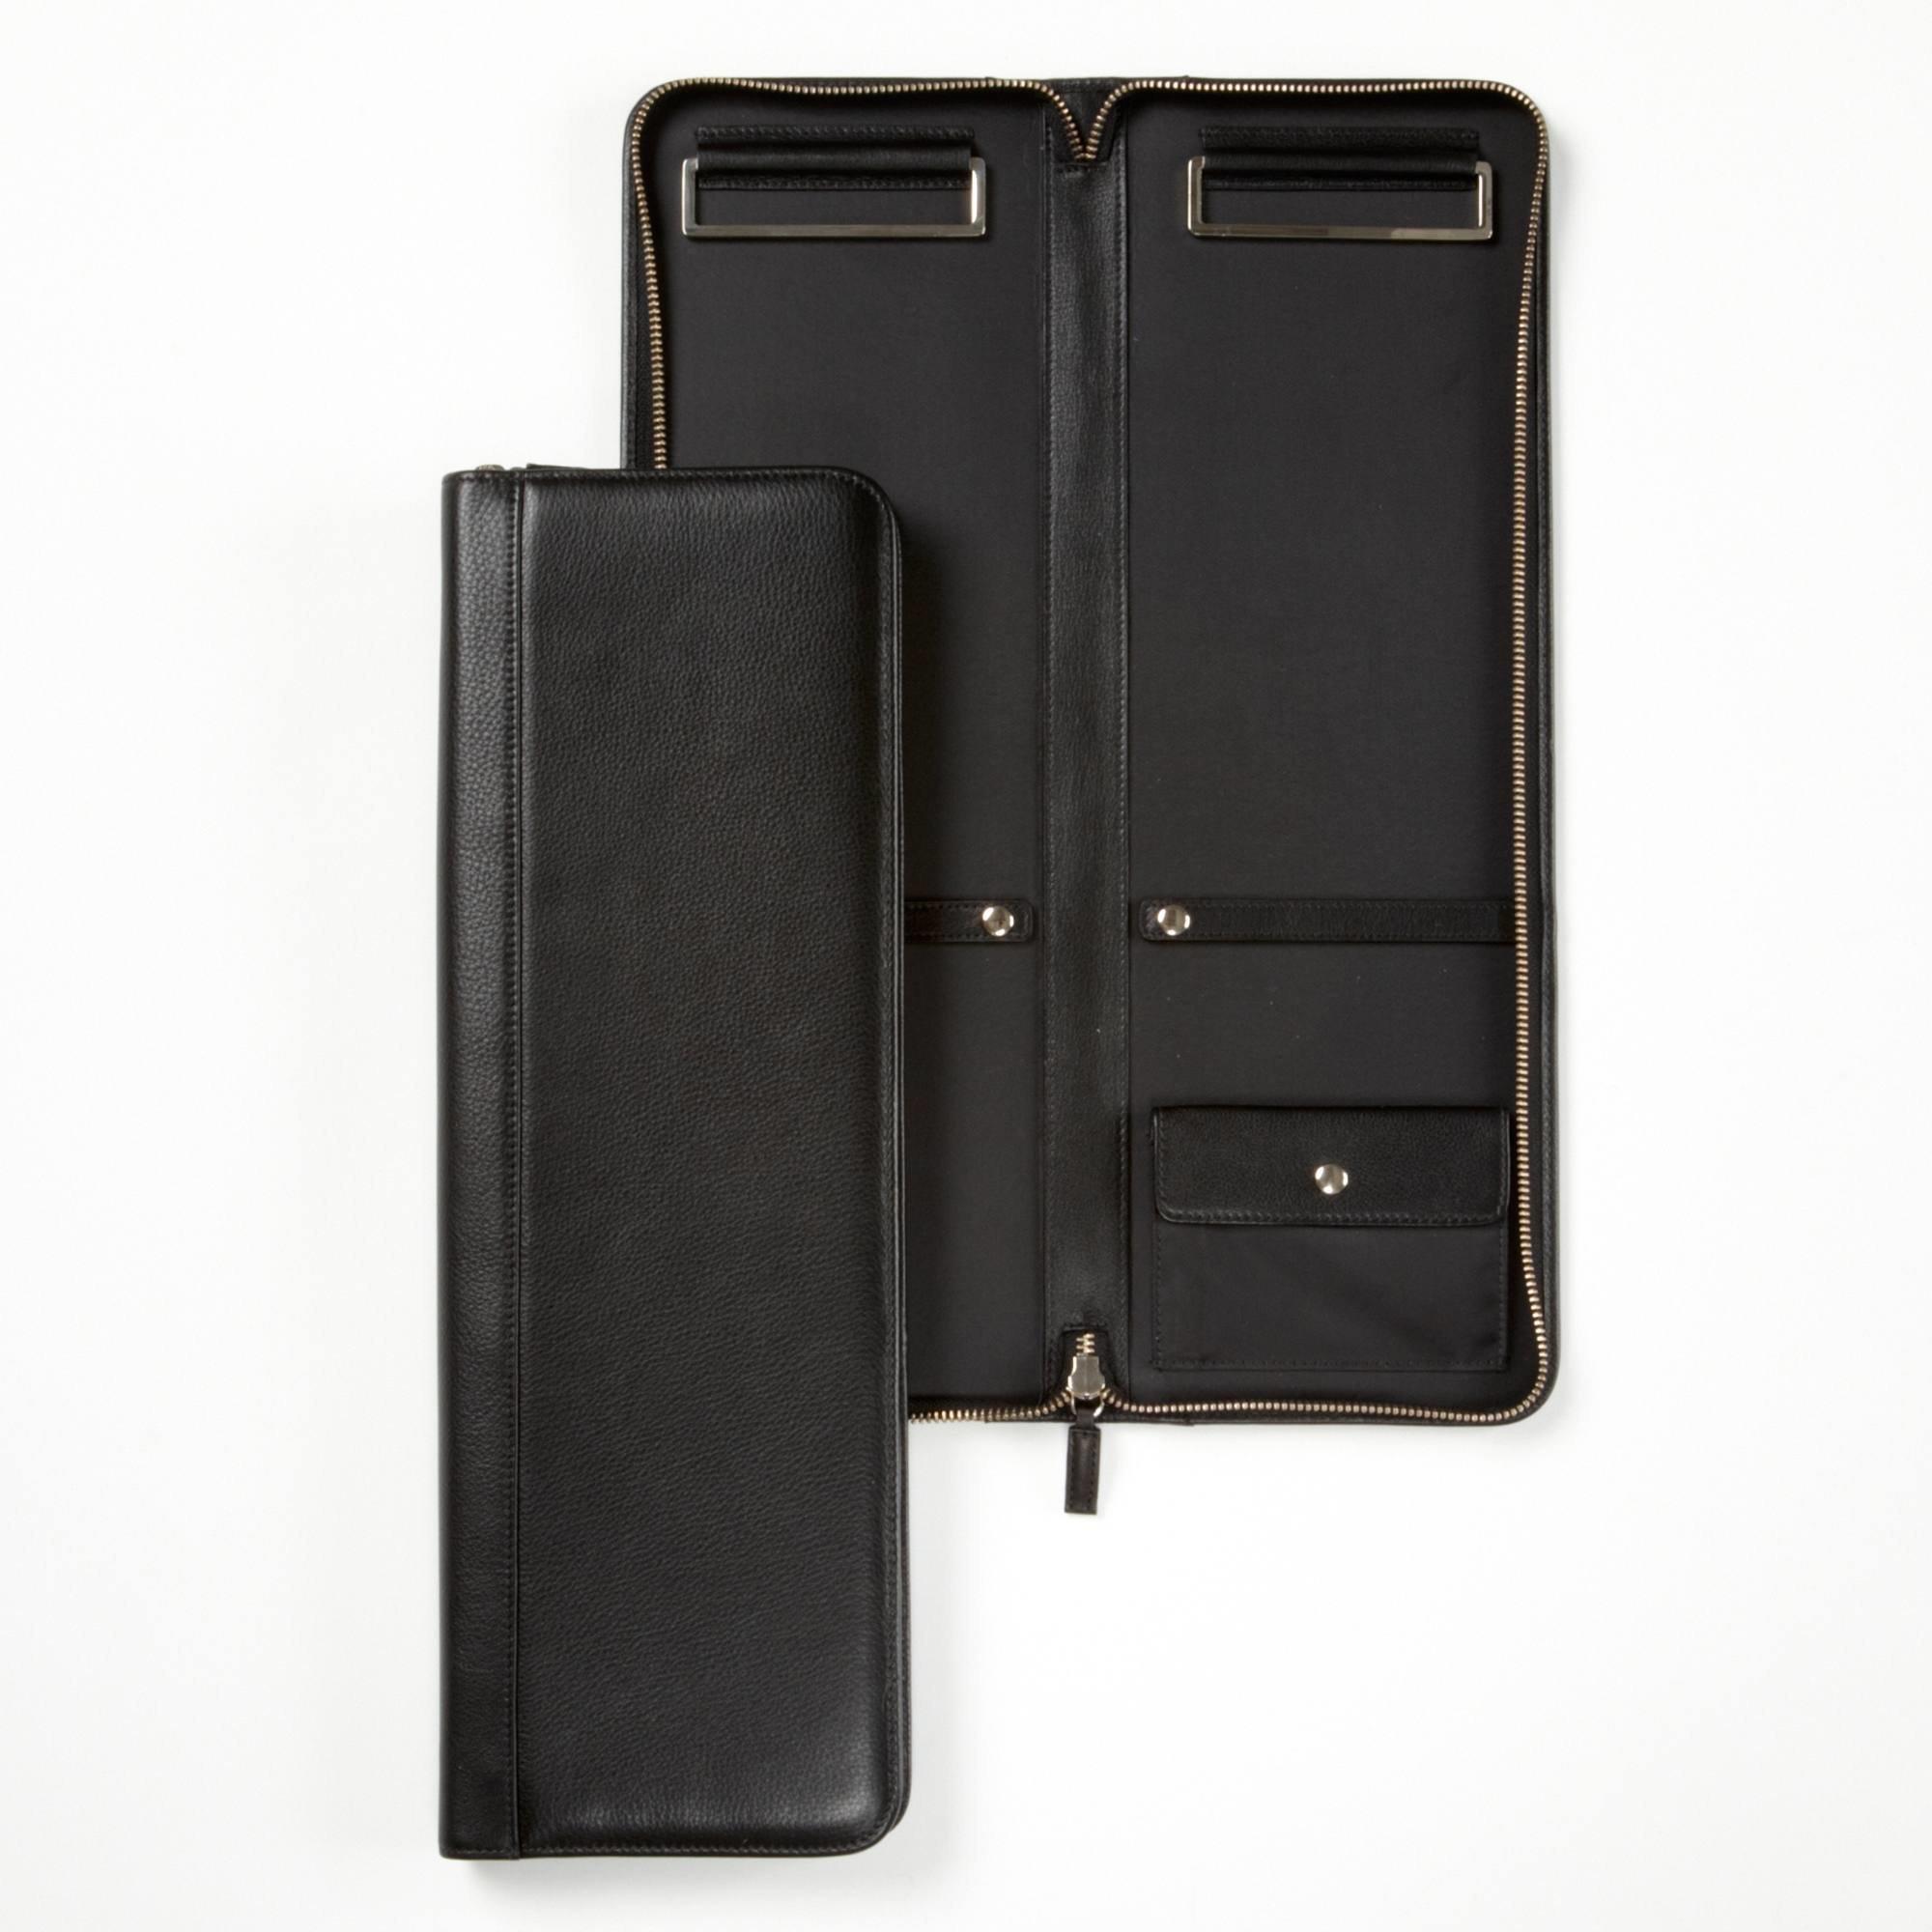 Tie Case - Full Grain Leather - Black Onyx (black)